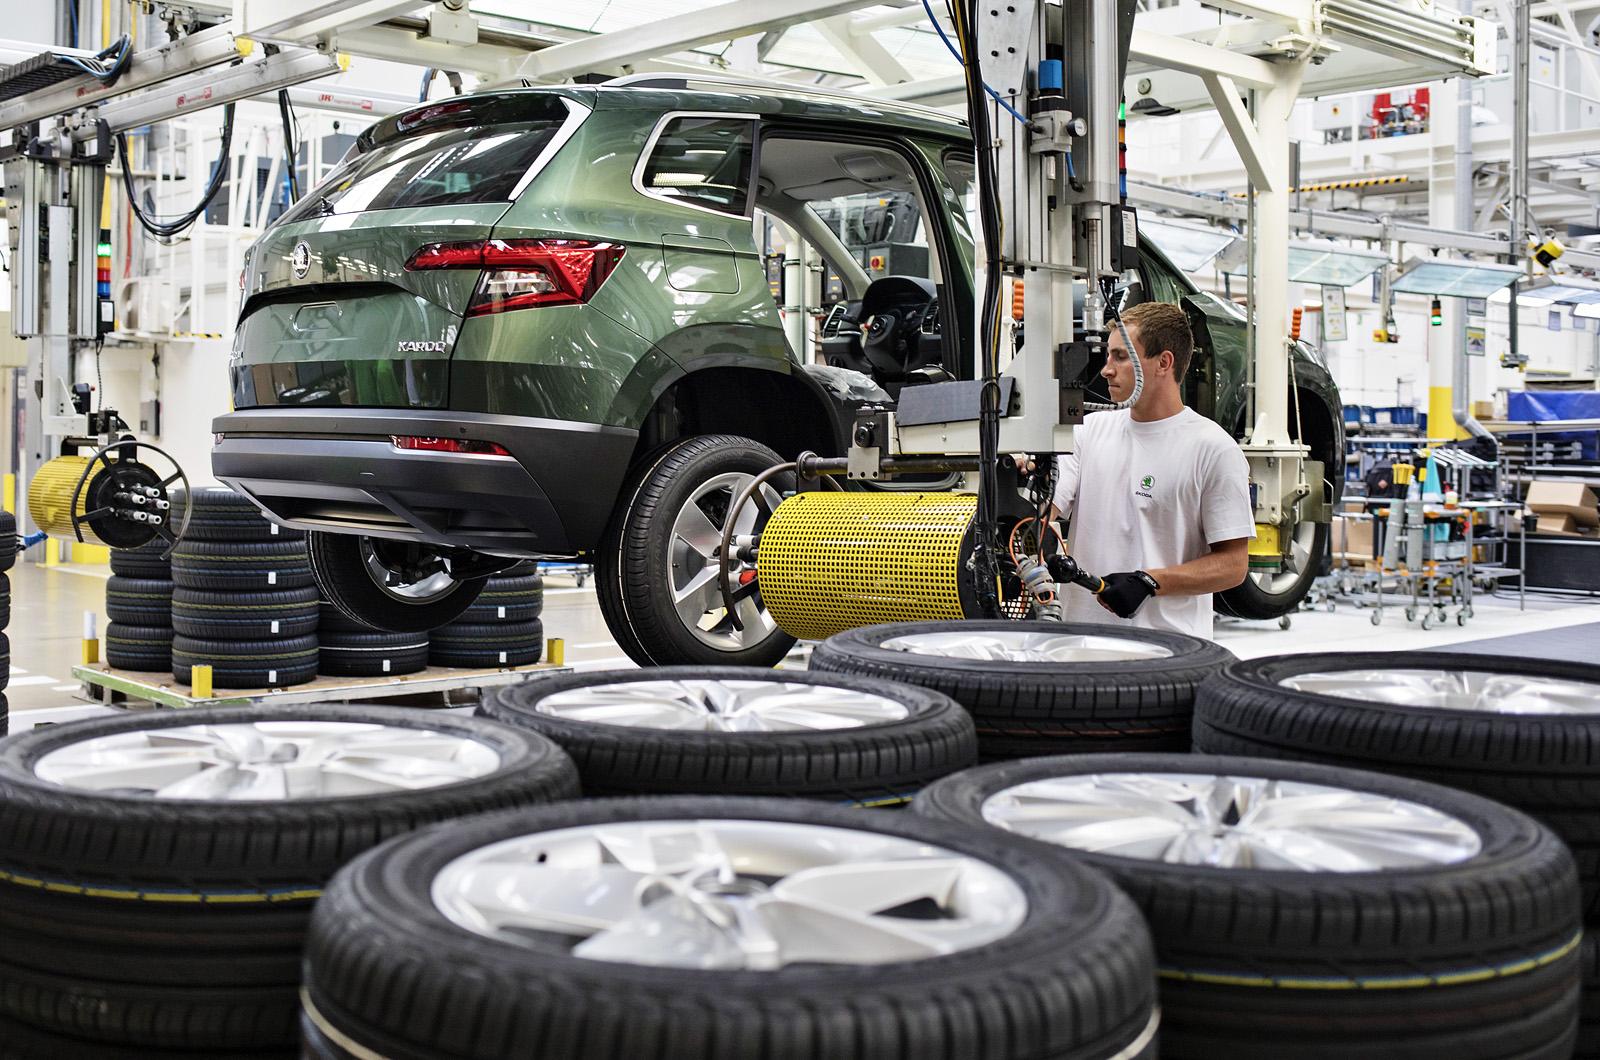 Skoda to build new European factory to meet demand | Autocar